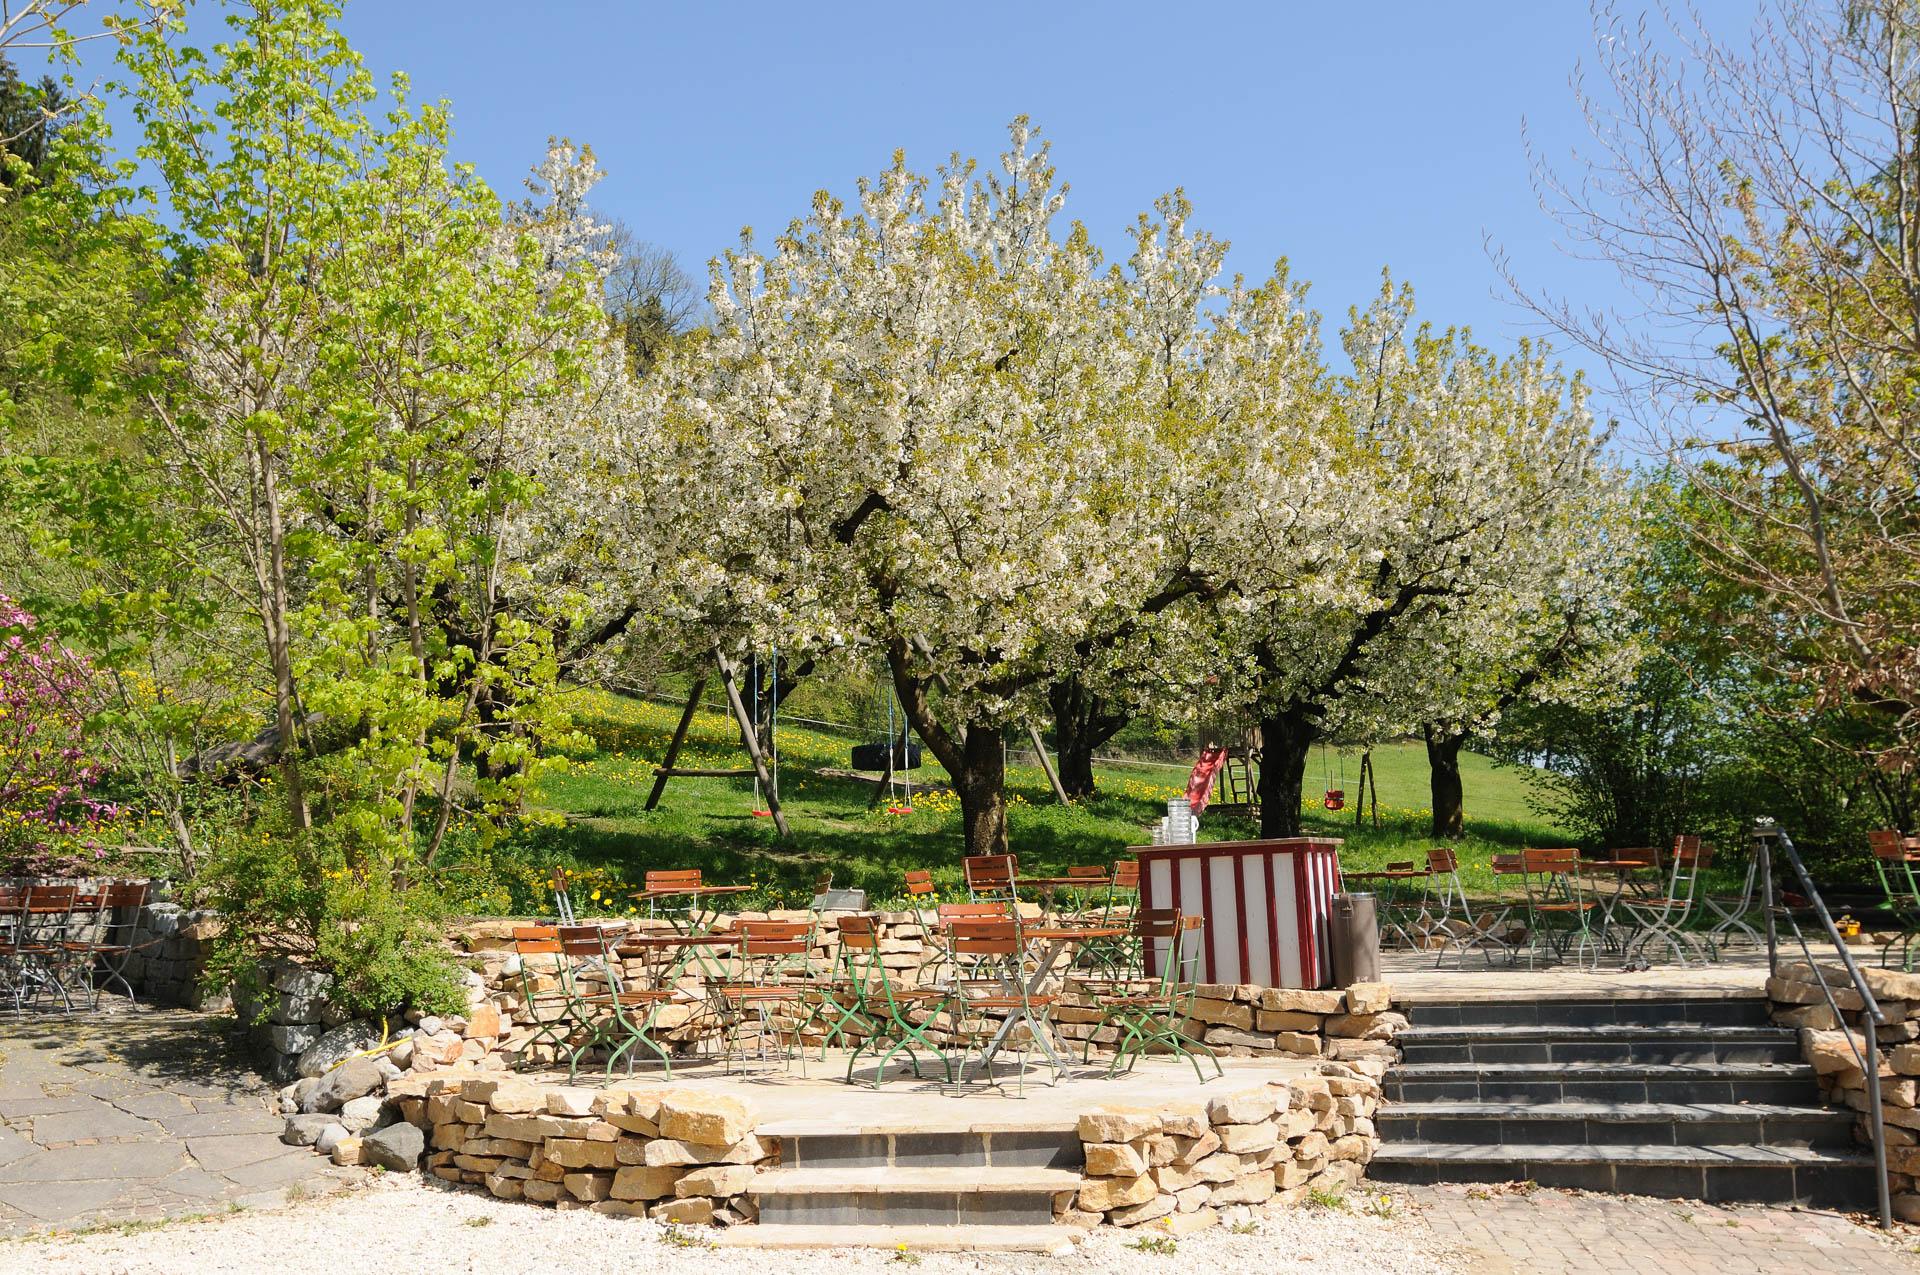 Obstblüte im Biergarten bei Kressbronn am Bodensee